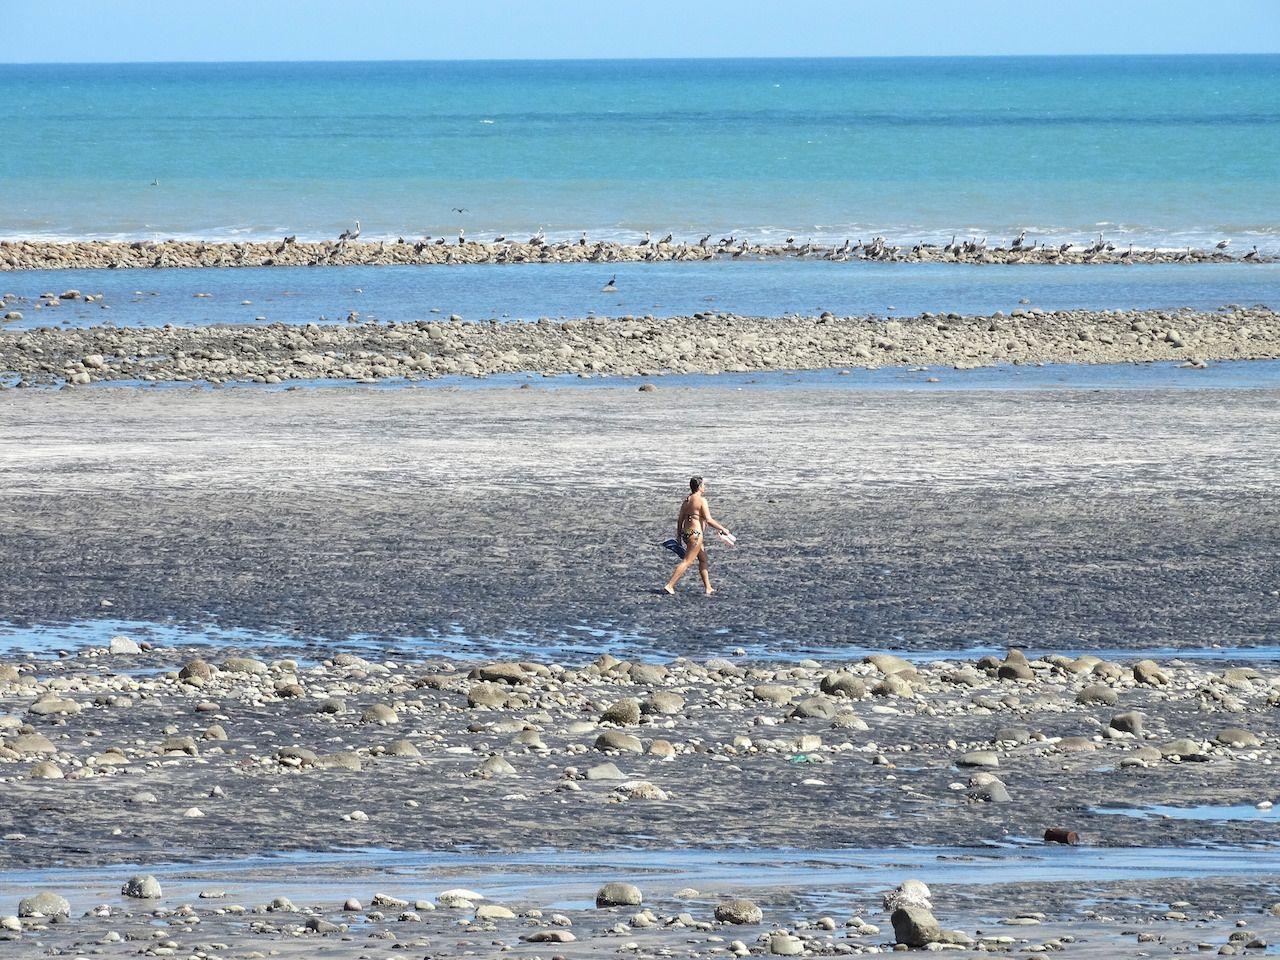 Playa El Palmar - Panama Province - Panama